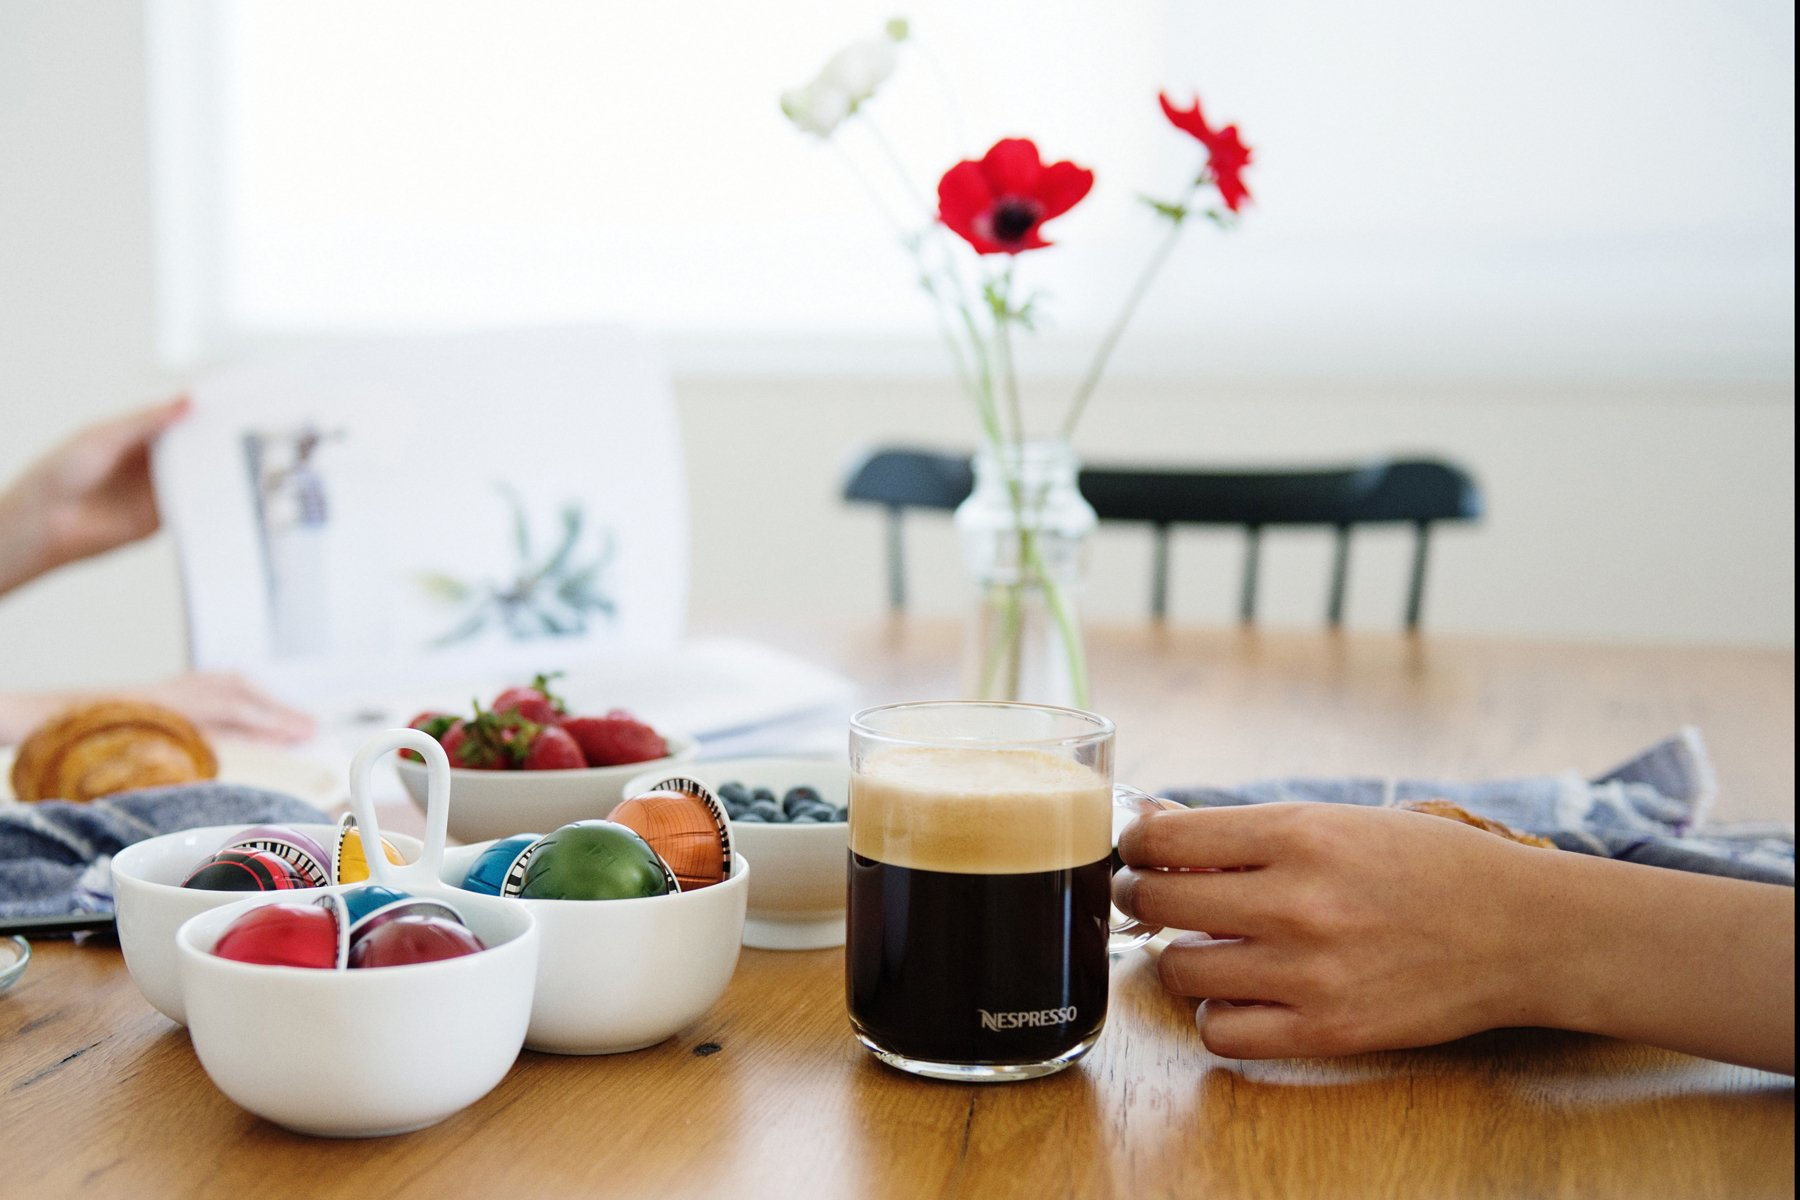 Nespresso VertuoLine Coffee, Intenso, 30 Count by Nespresso (Image #2)